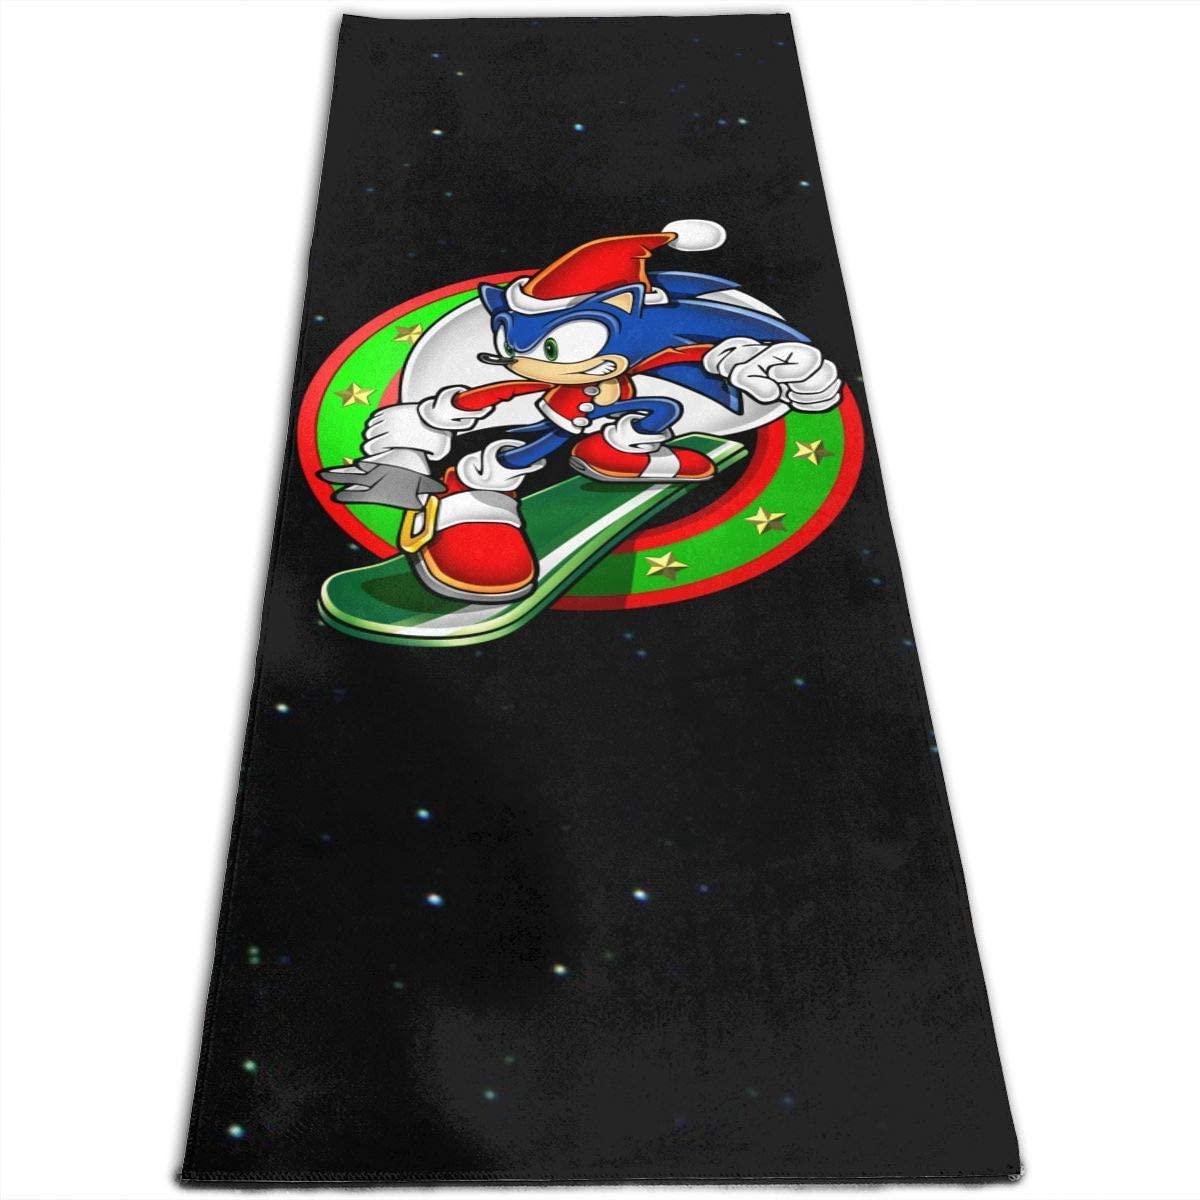 10sdaklasd Christmas Sonic The Hedgehog Yoga Mat 4-5mm